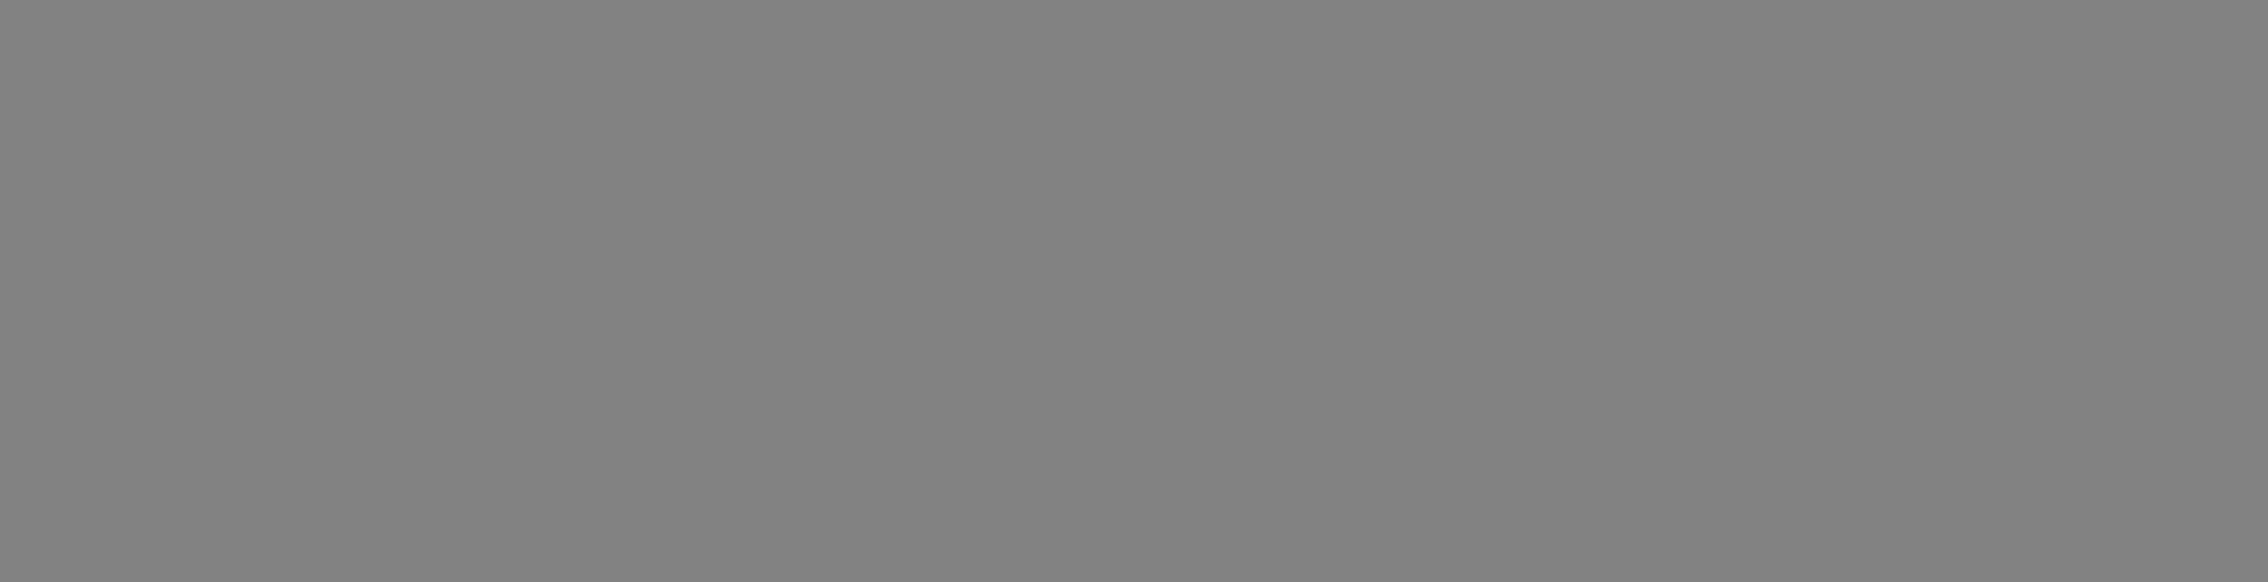 Buzz client logo